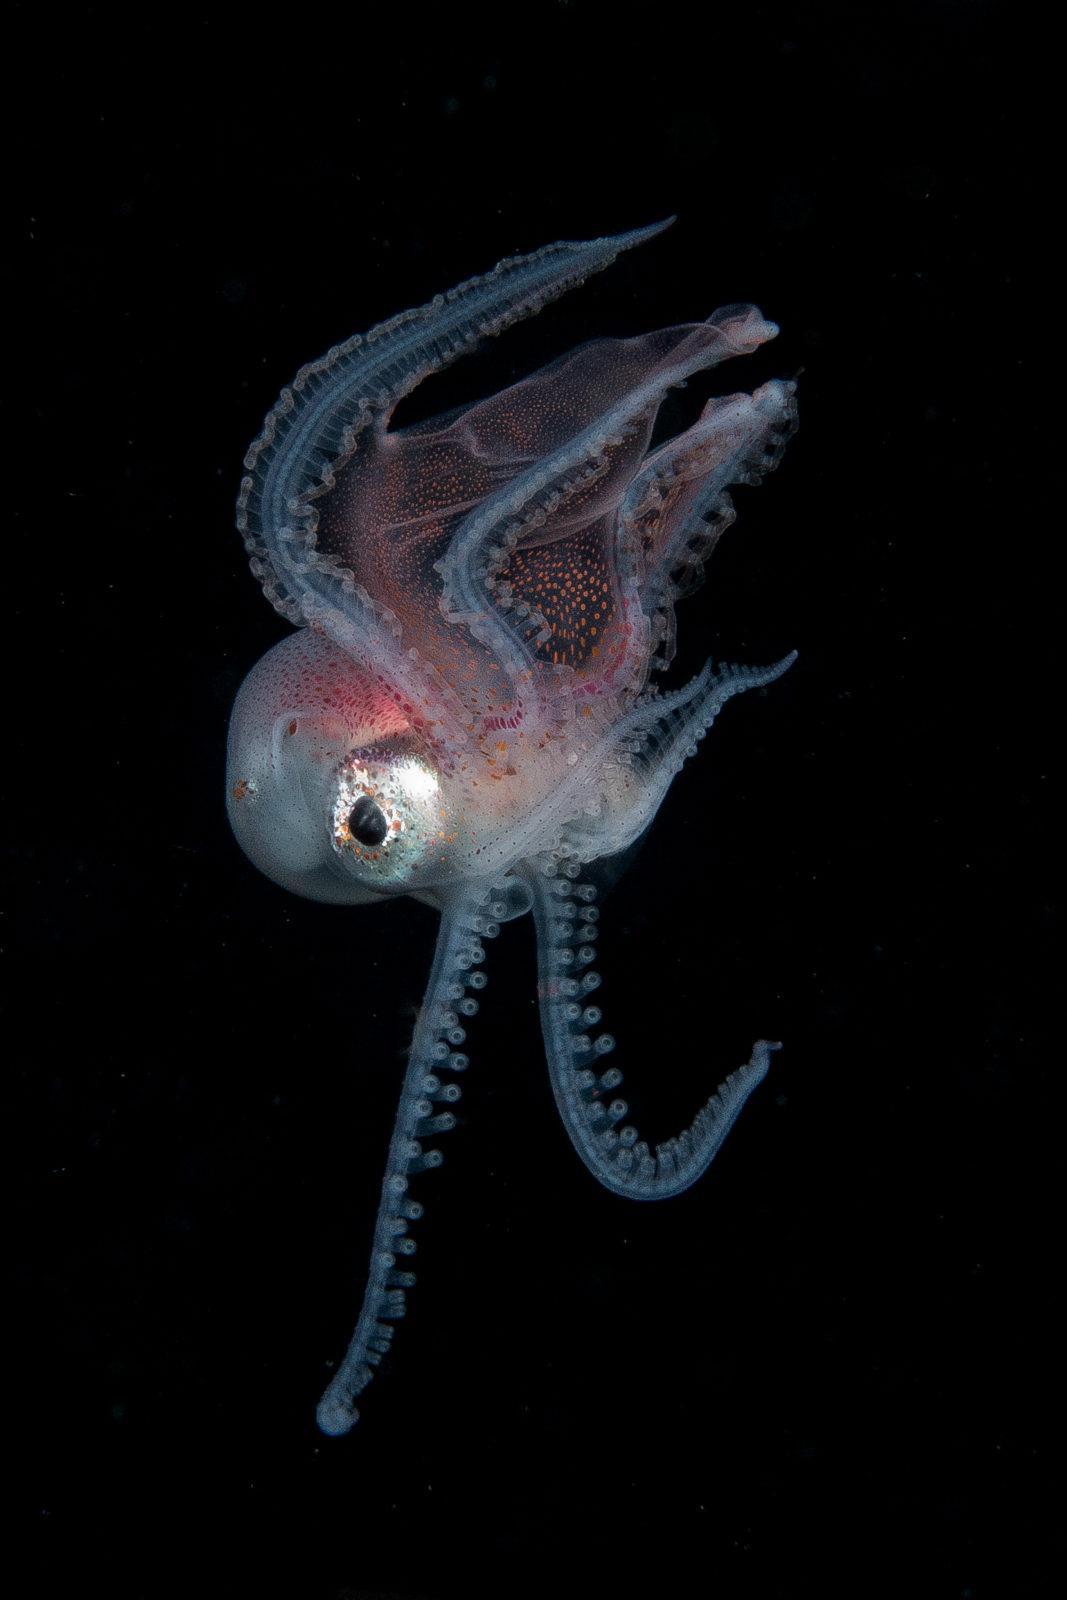 Blanket Octopus: The Black Water World